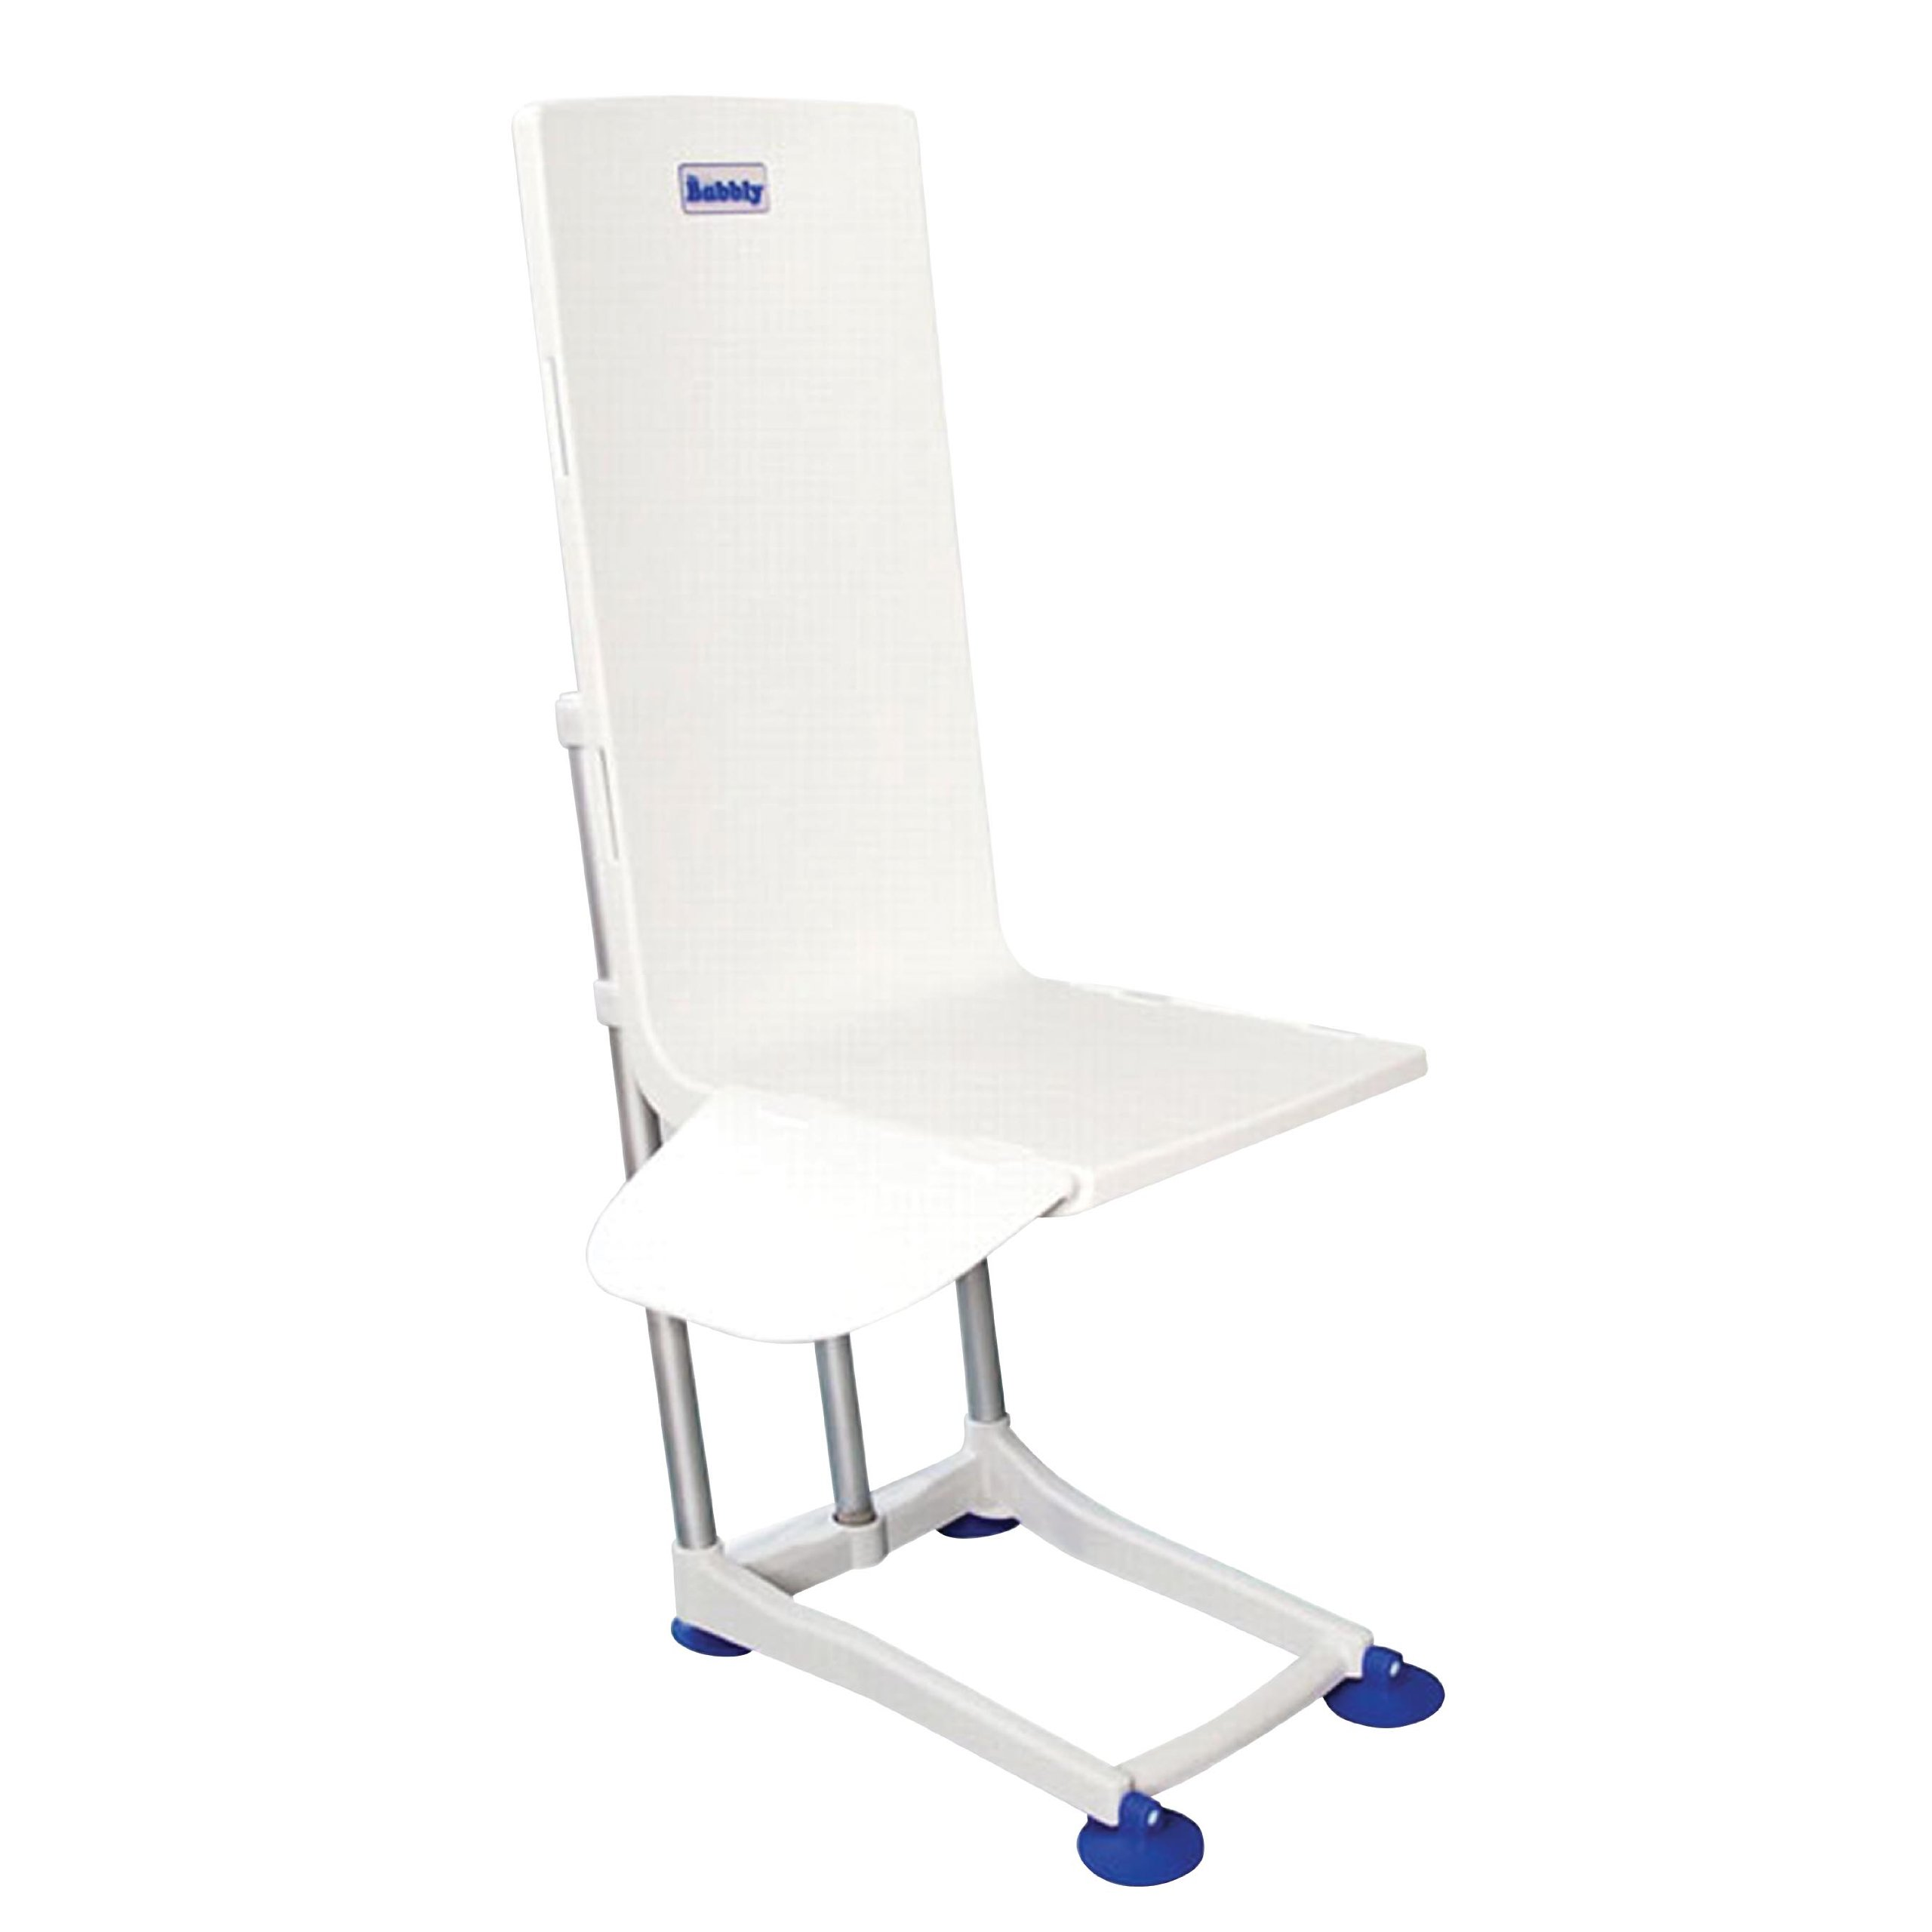 Drive Medical Aquajoy Saver Bathlift, White